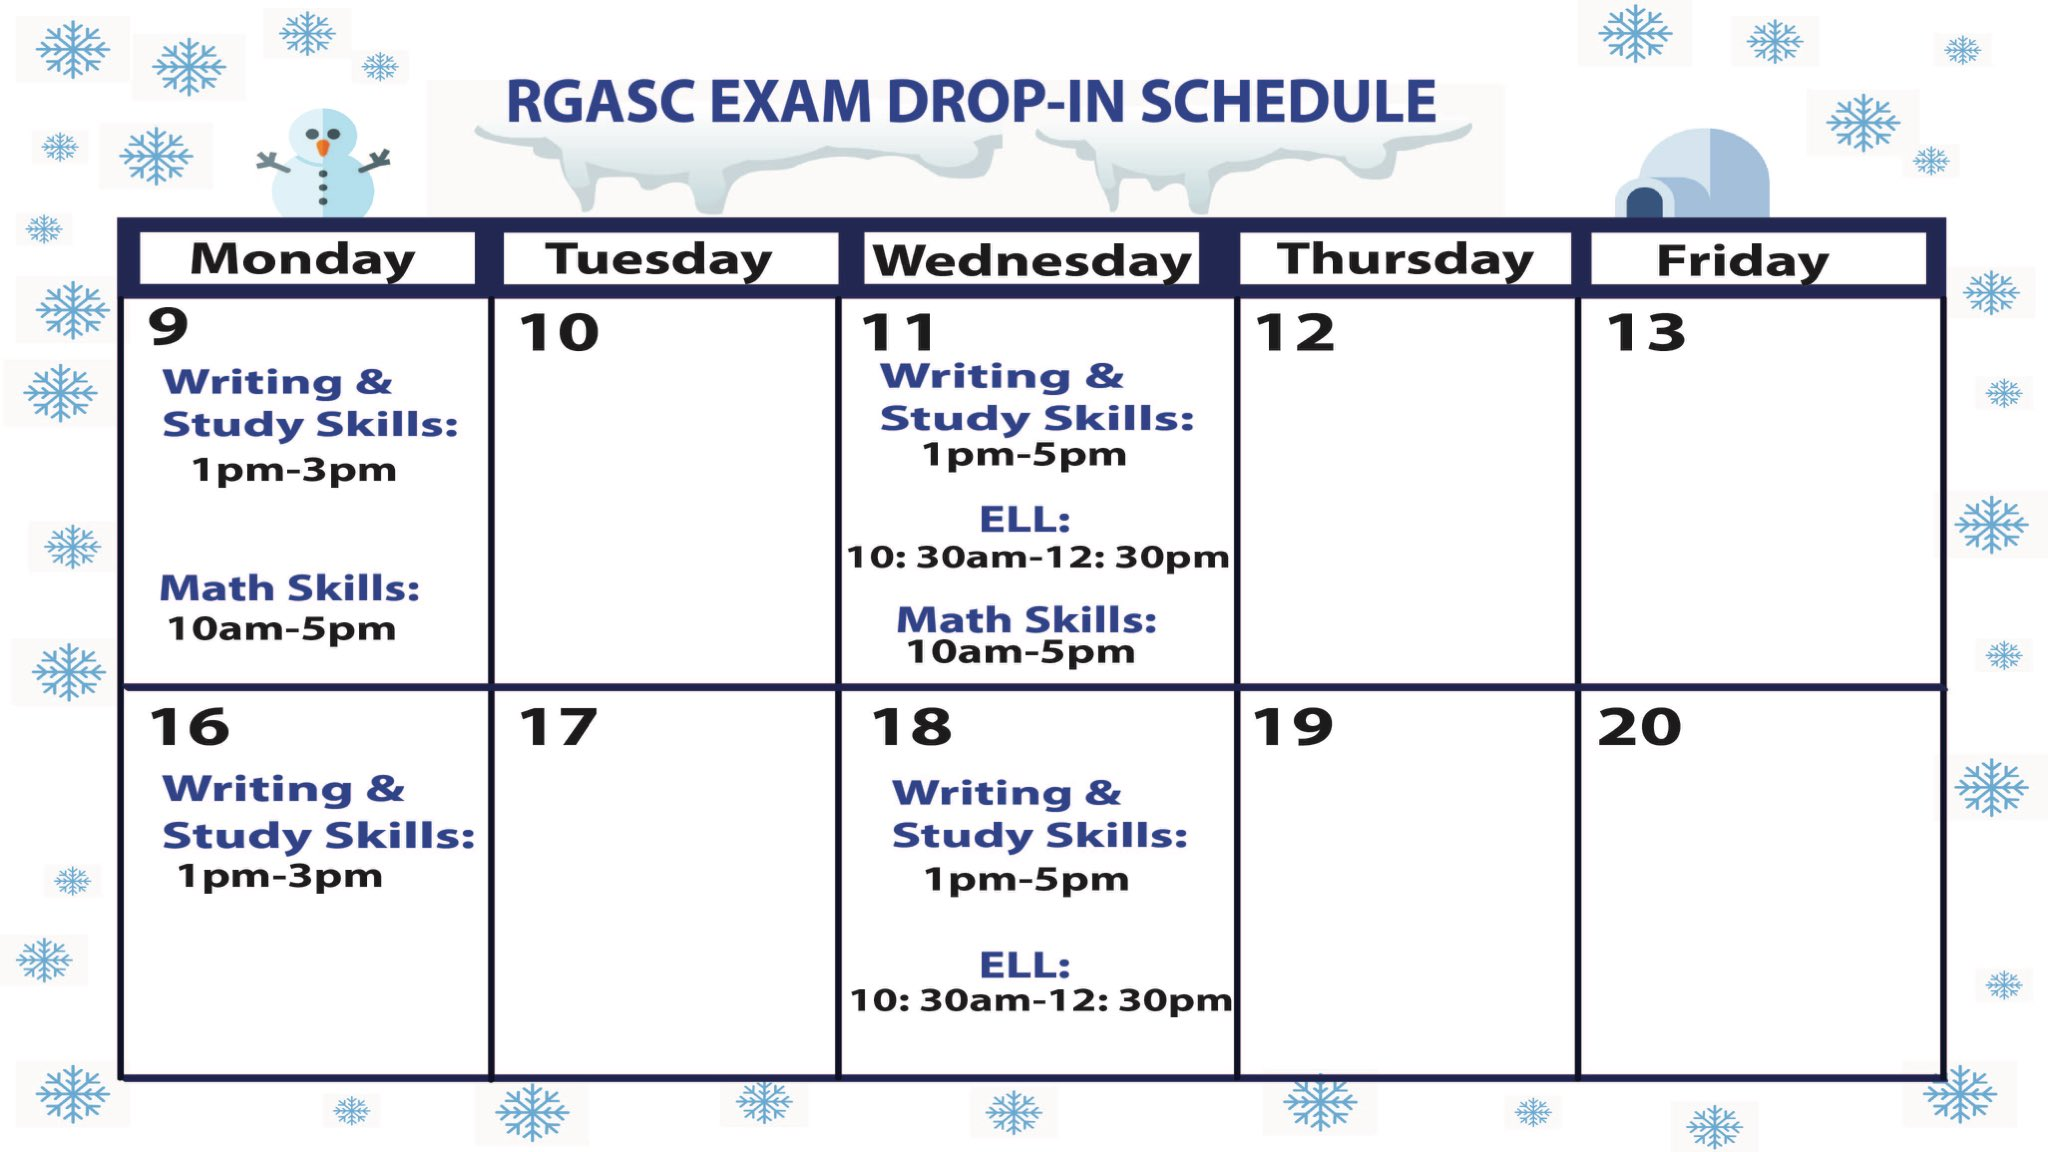 RGASC 2019f Exam Schedule